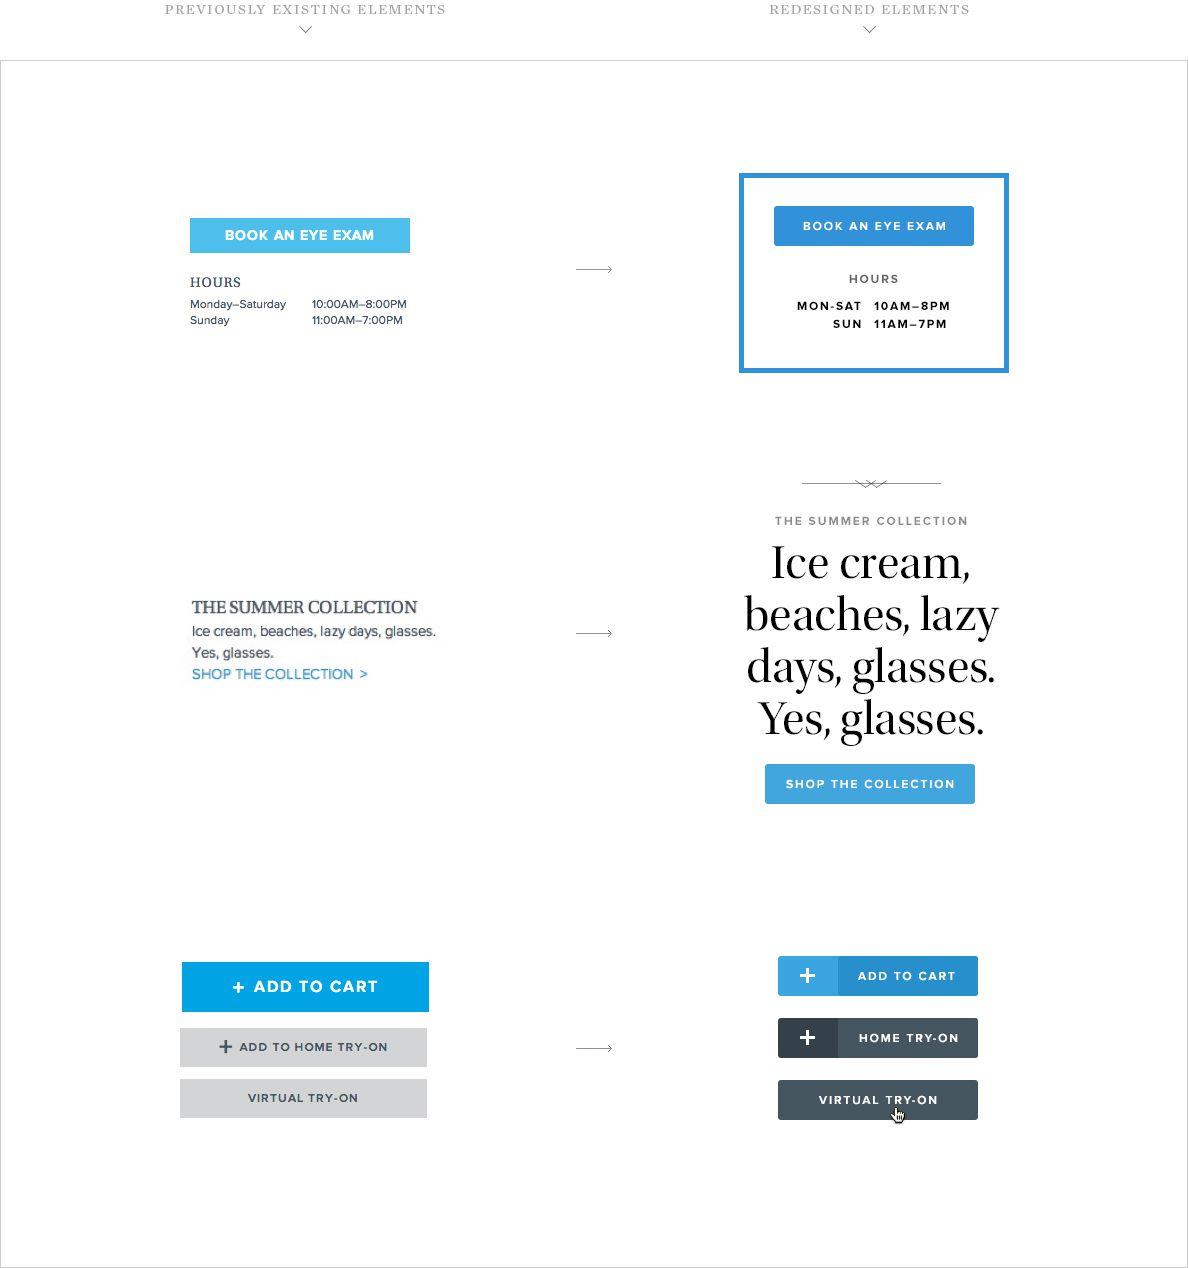 Pemberton - Warby Parker redesigned elements | Web & UI